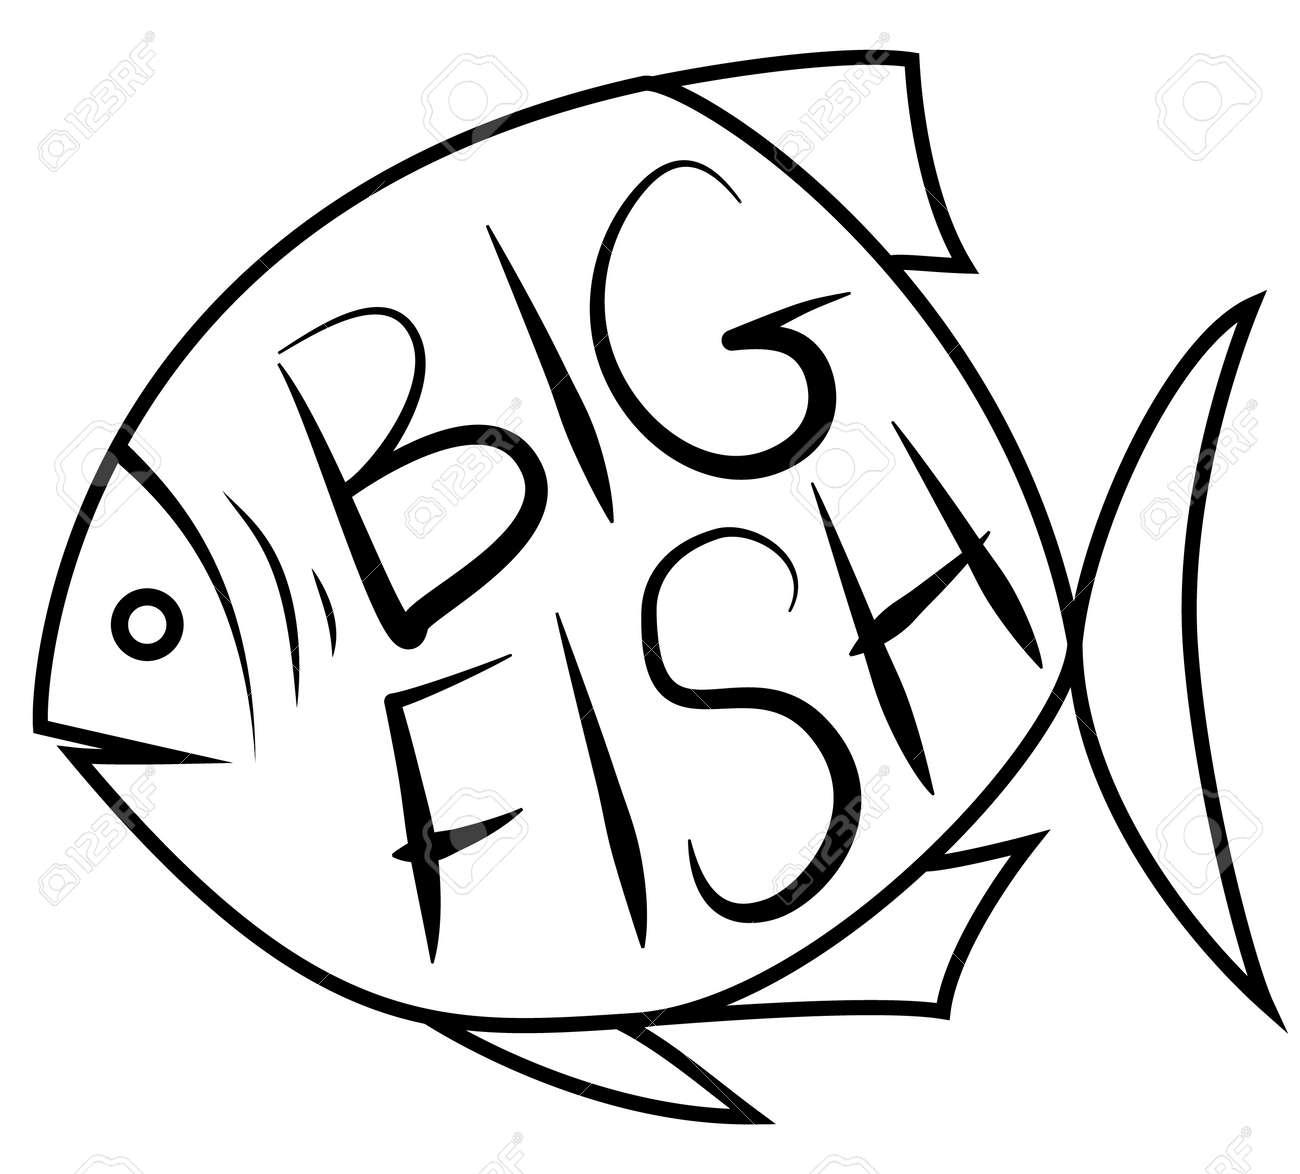 Big Fish Background For Text Fish Frame Vector Illustration